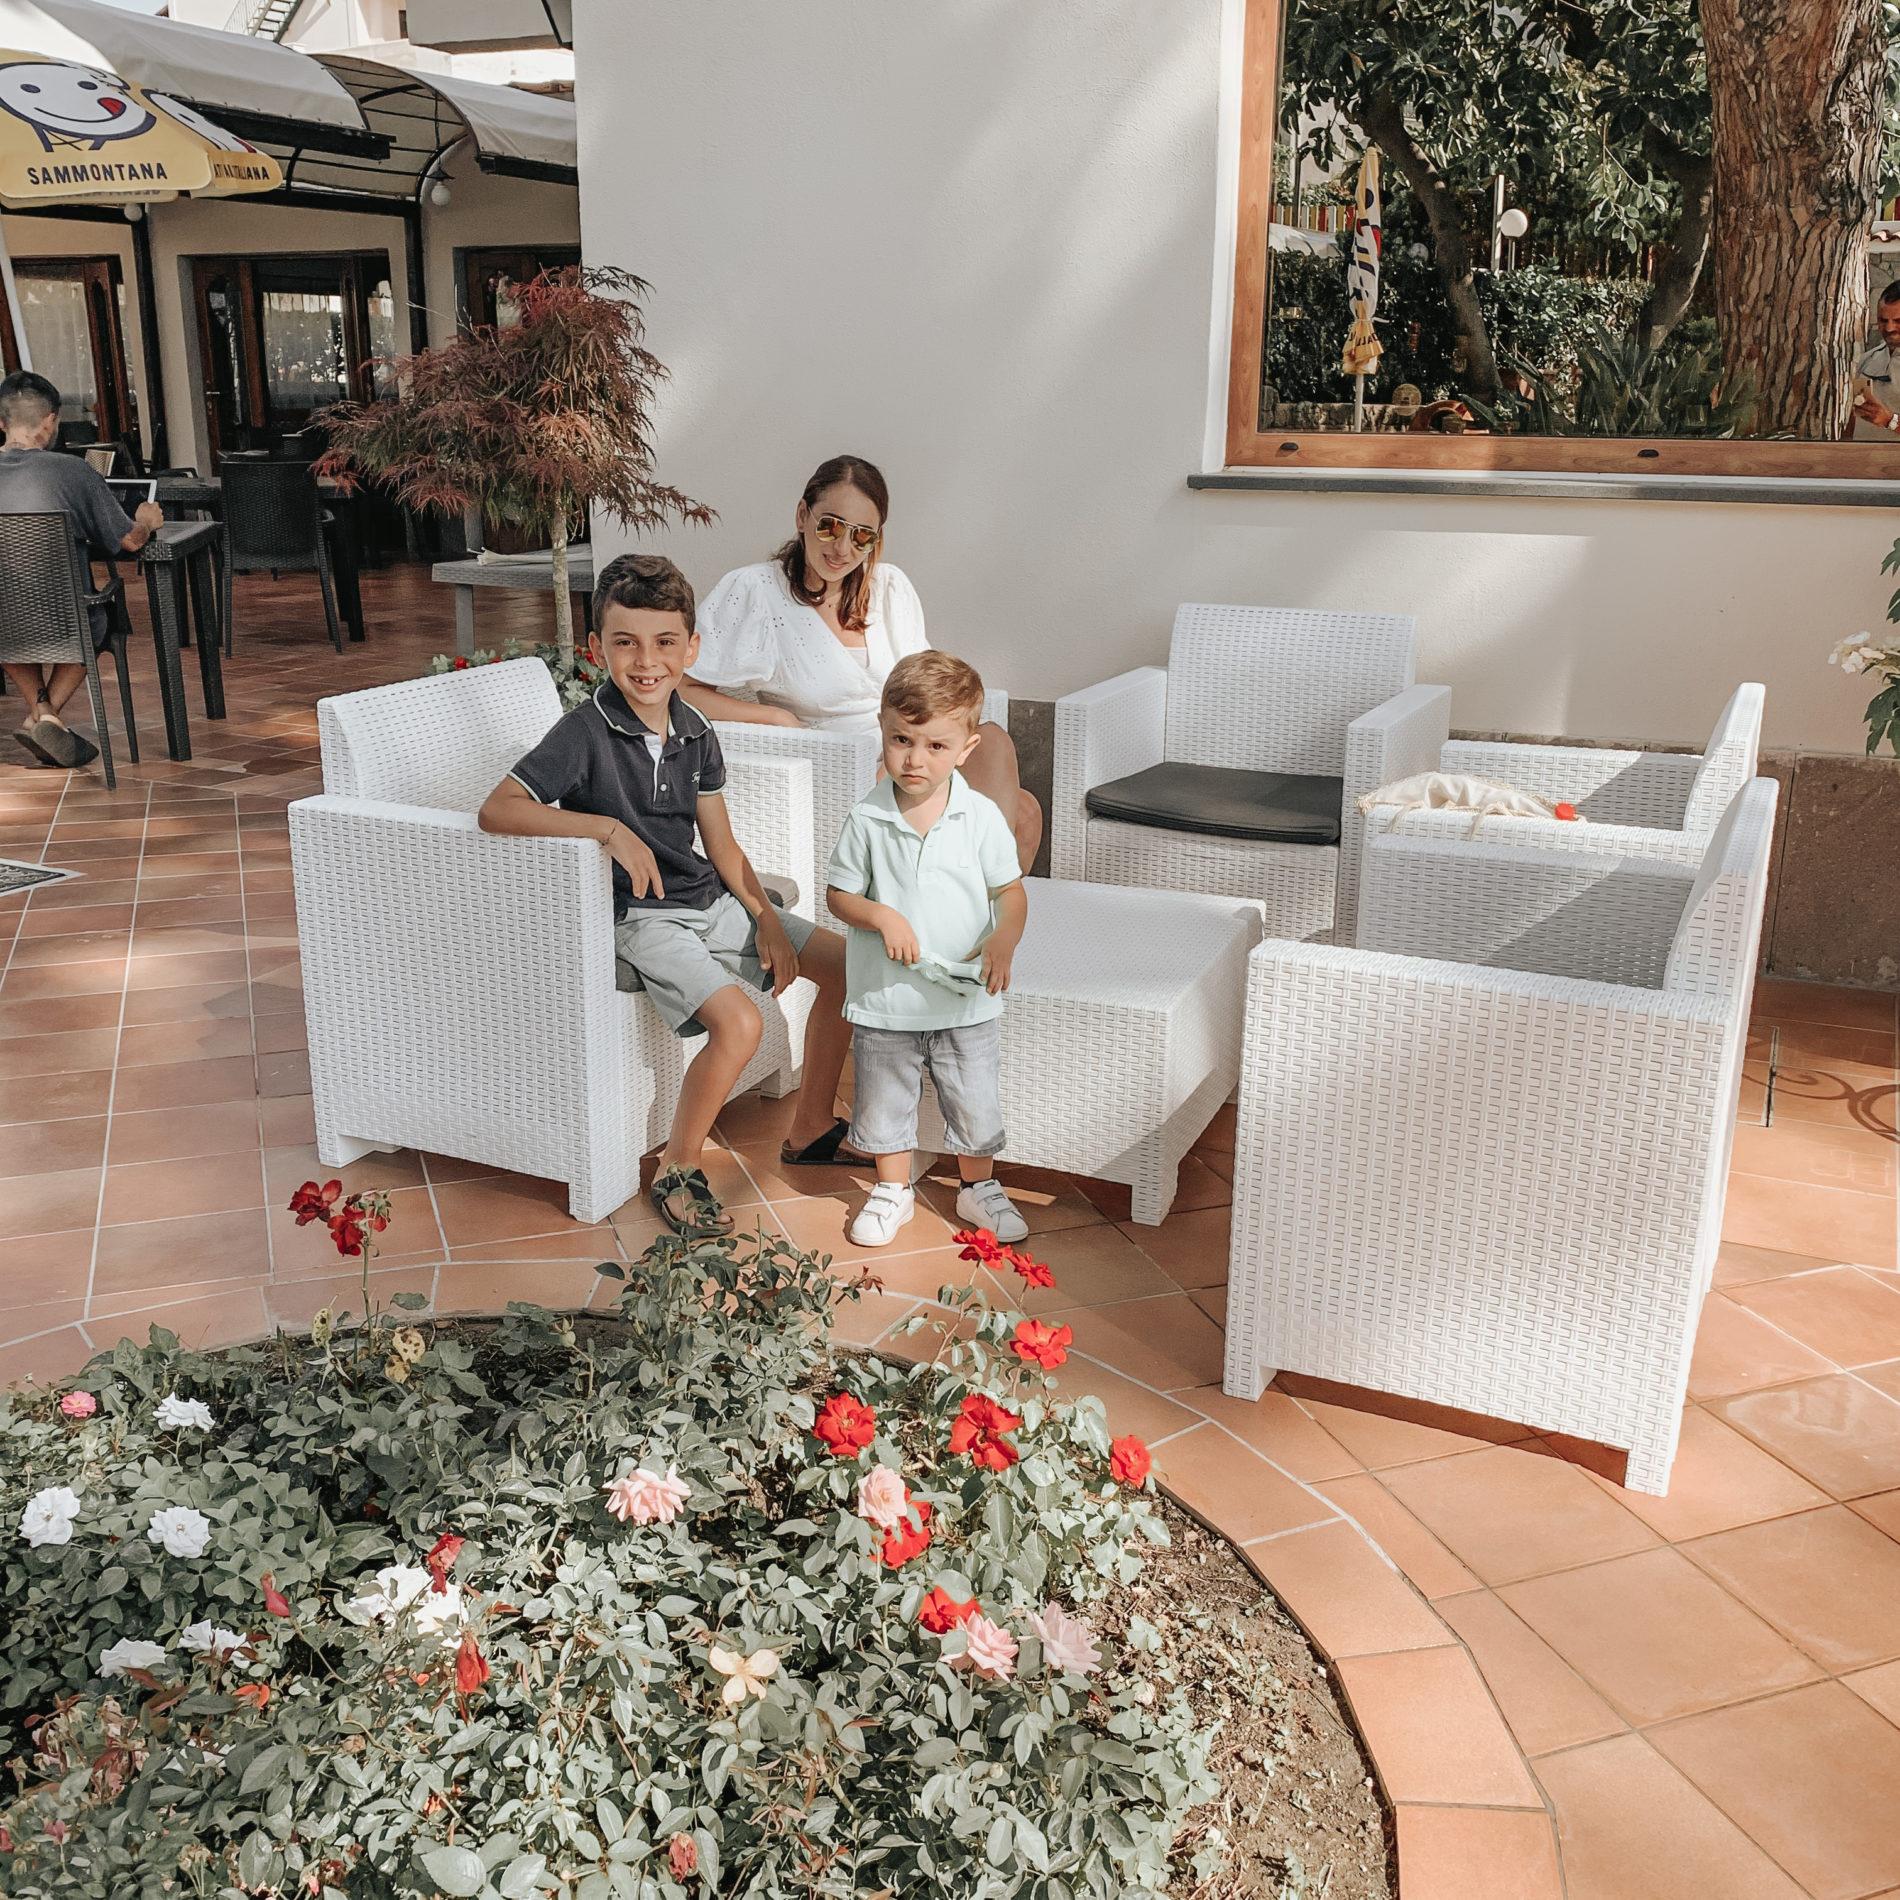 ospiti al family hotel le canne ad Ischia